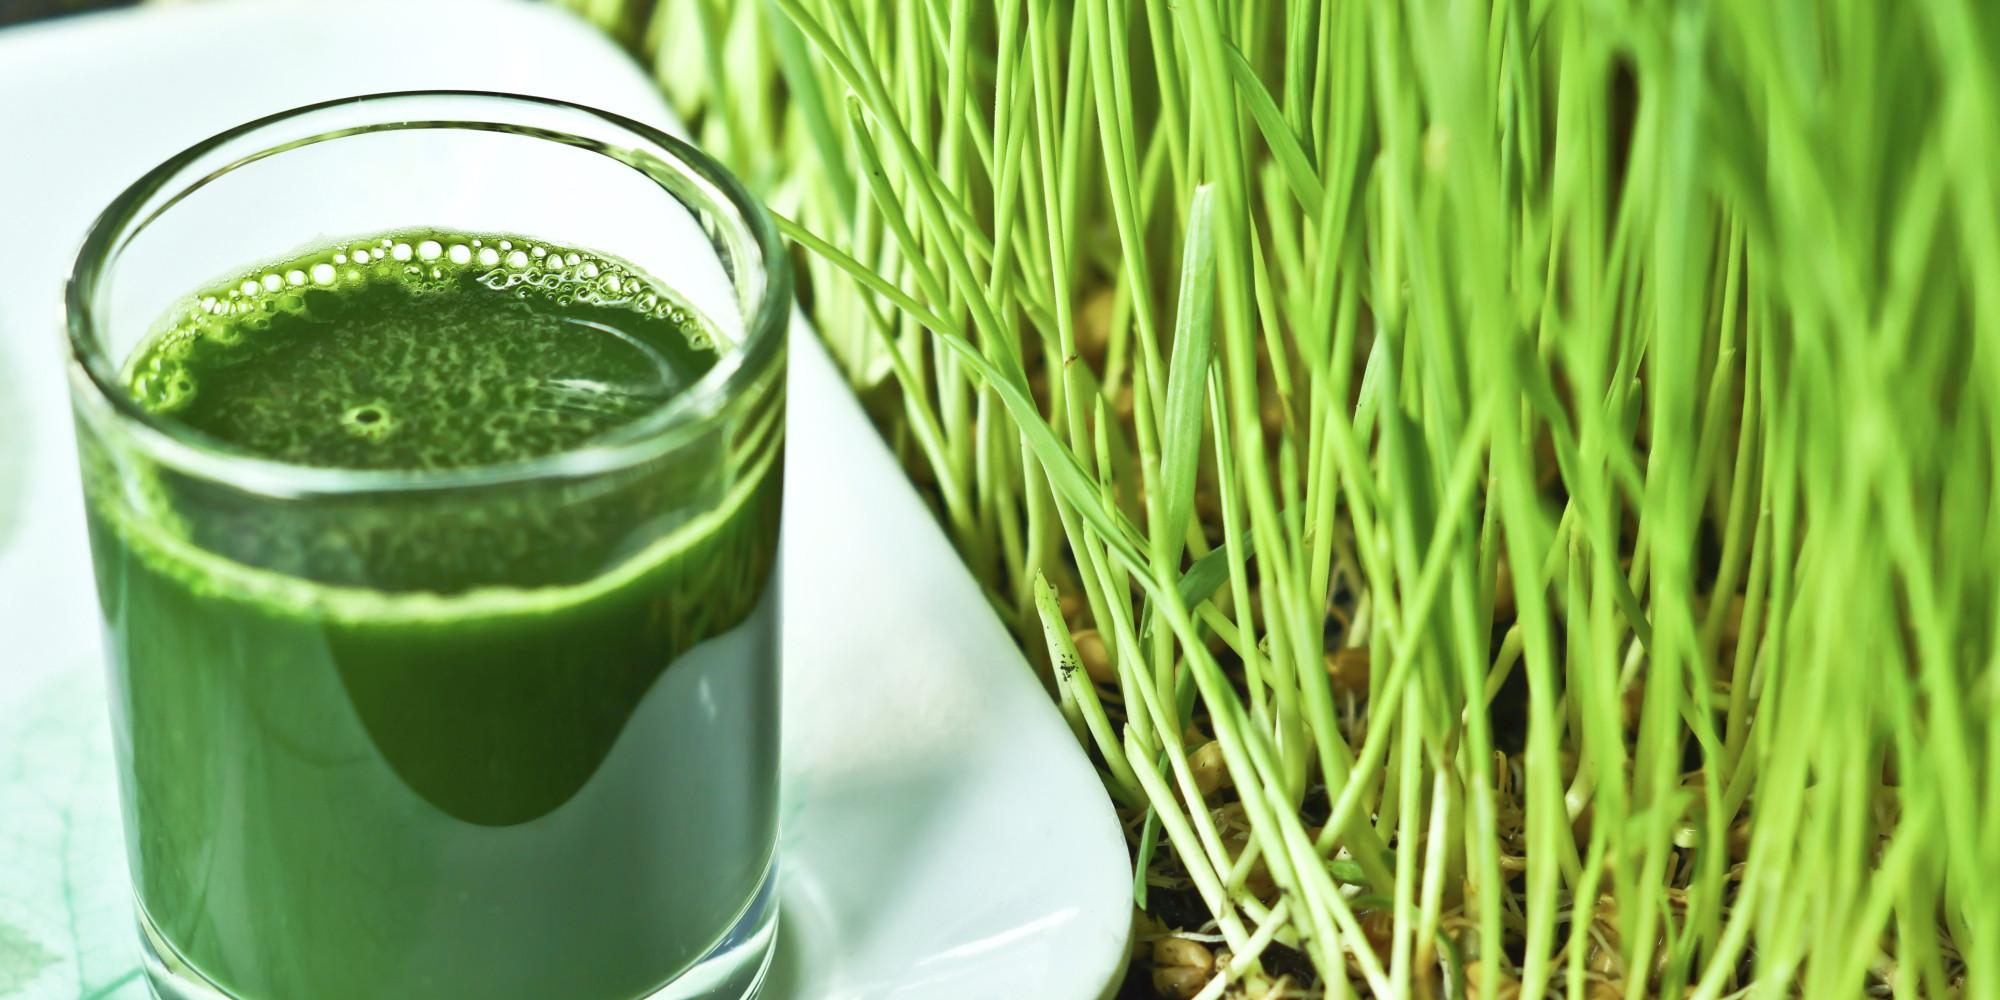 The Superfood Grass: Wheatgrass